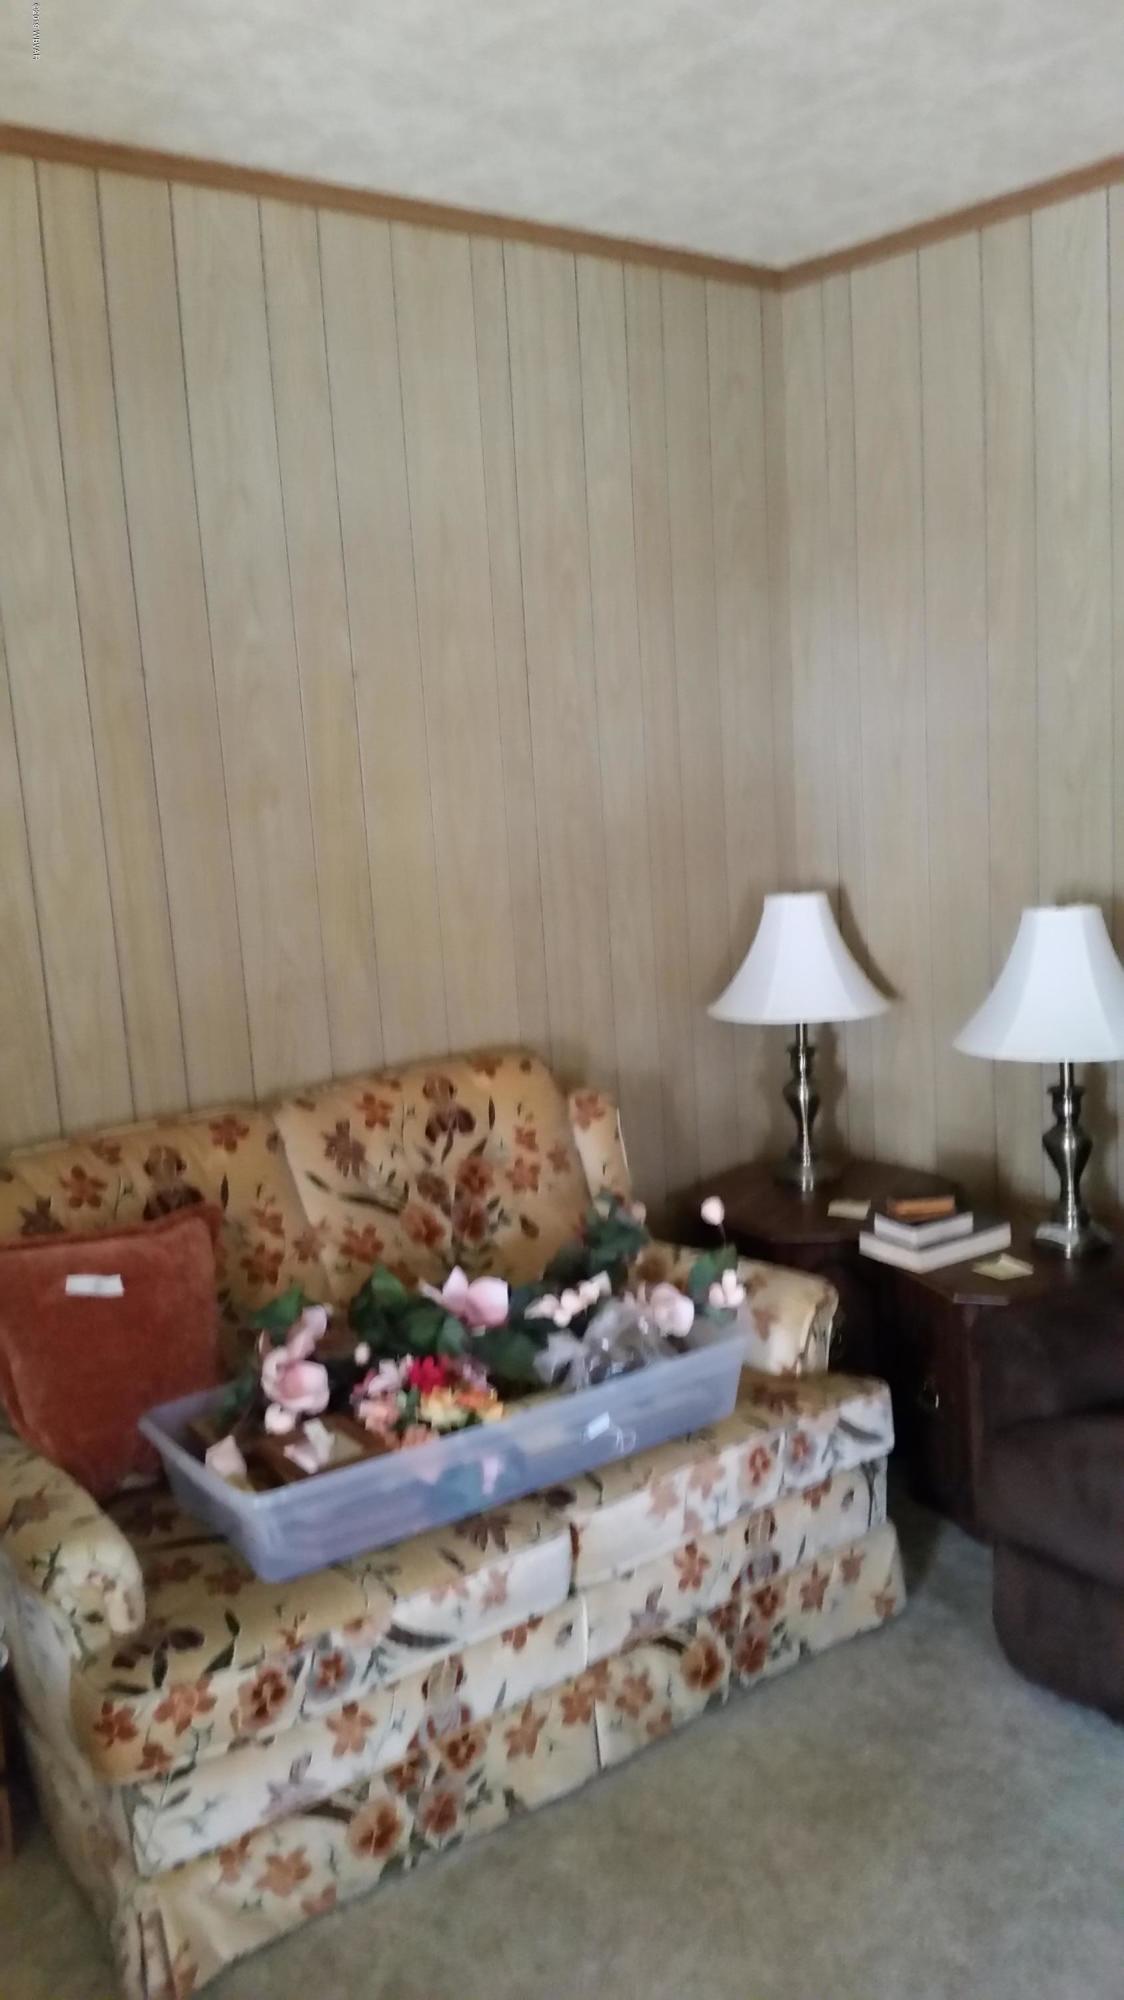 98 FAIRVIEW STREET STREET,Beech Creek,PA 16822,3 Bedrooms Bedrooms,1 BathroomBathrooms,Residential,FAIRVIEW STREET,WB-86984